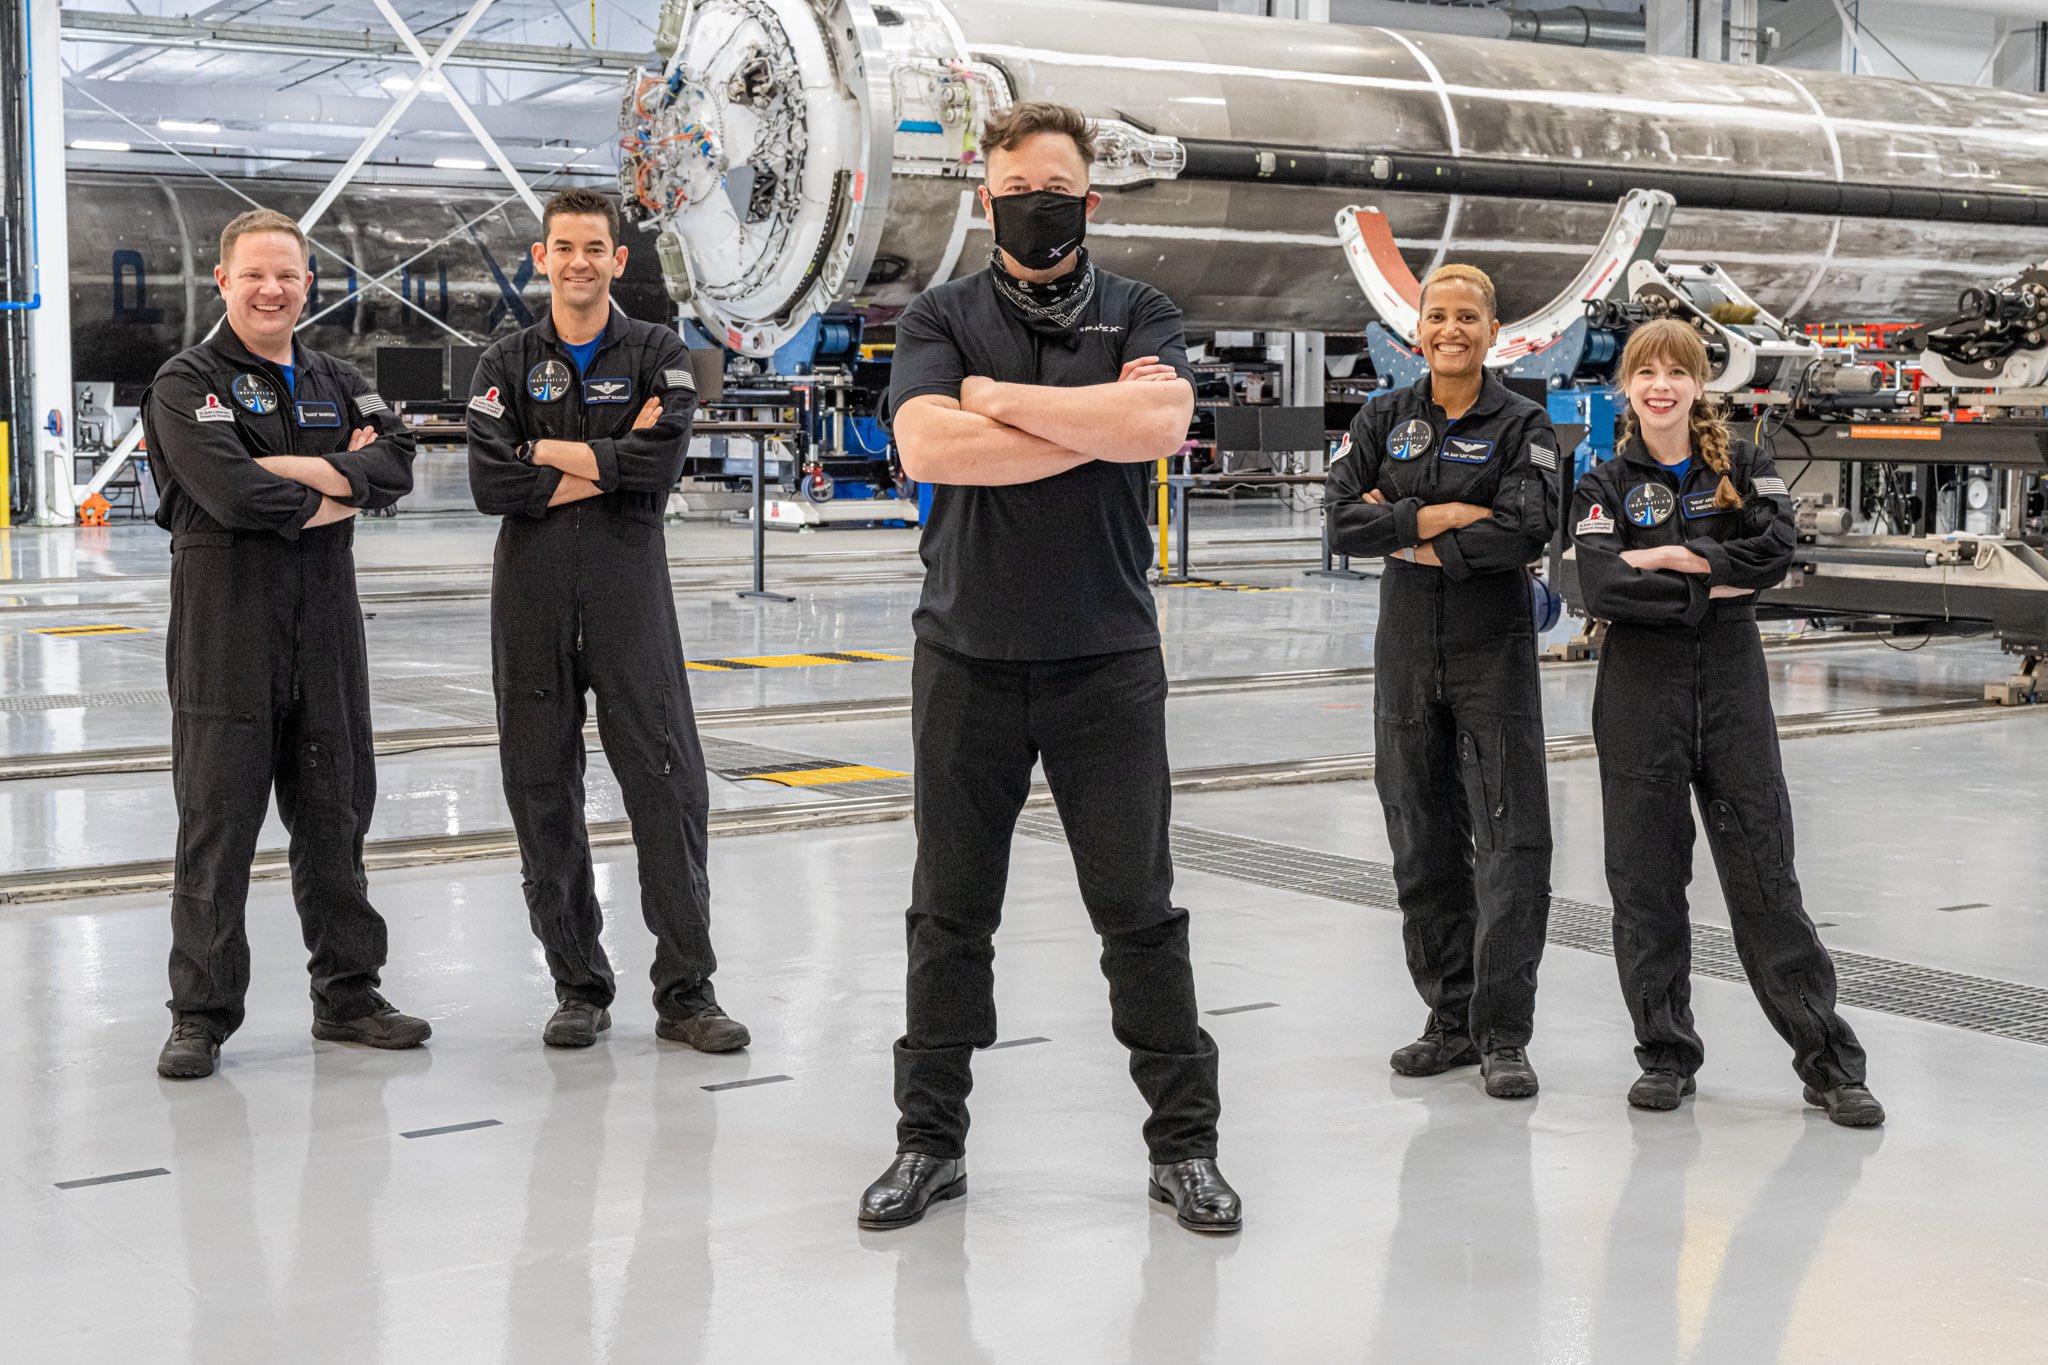 I quattro di Inspiration4 assieme ad Elon Musk. Credits: SpaceX